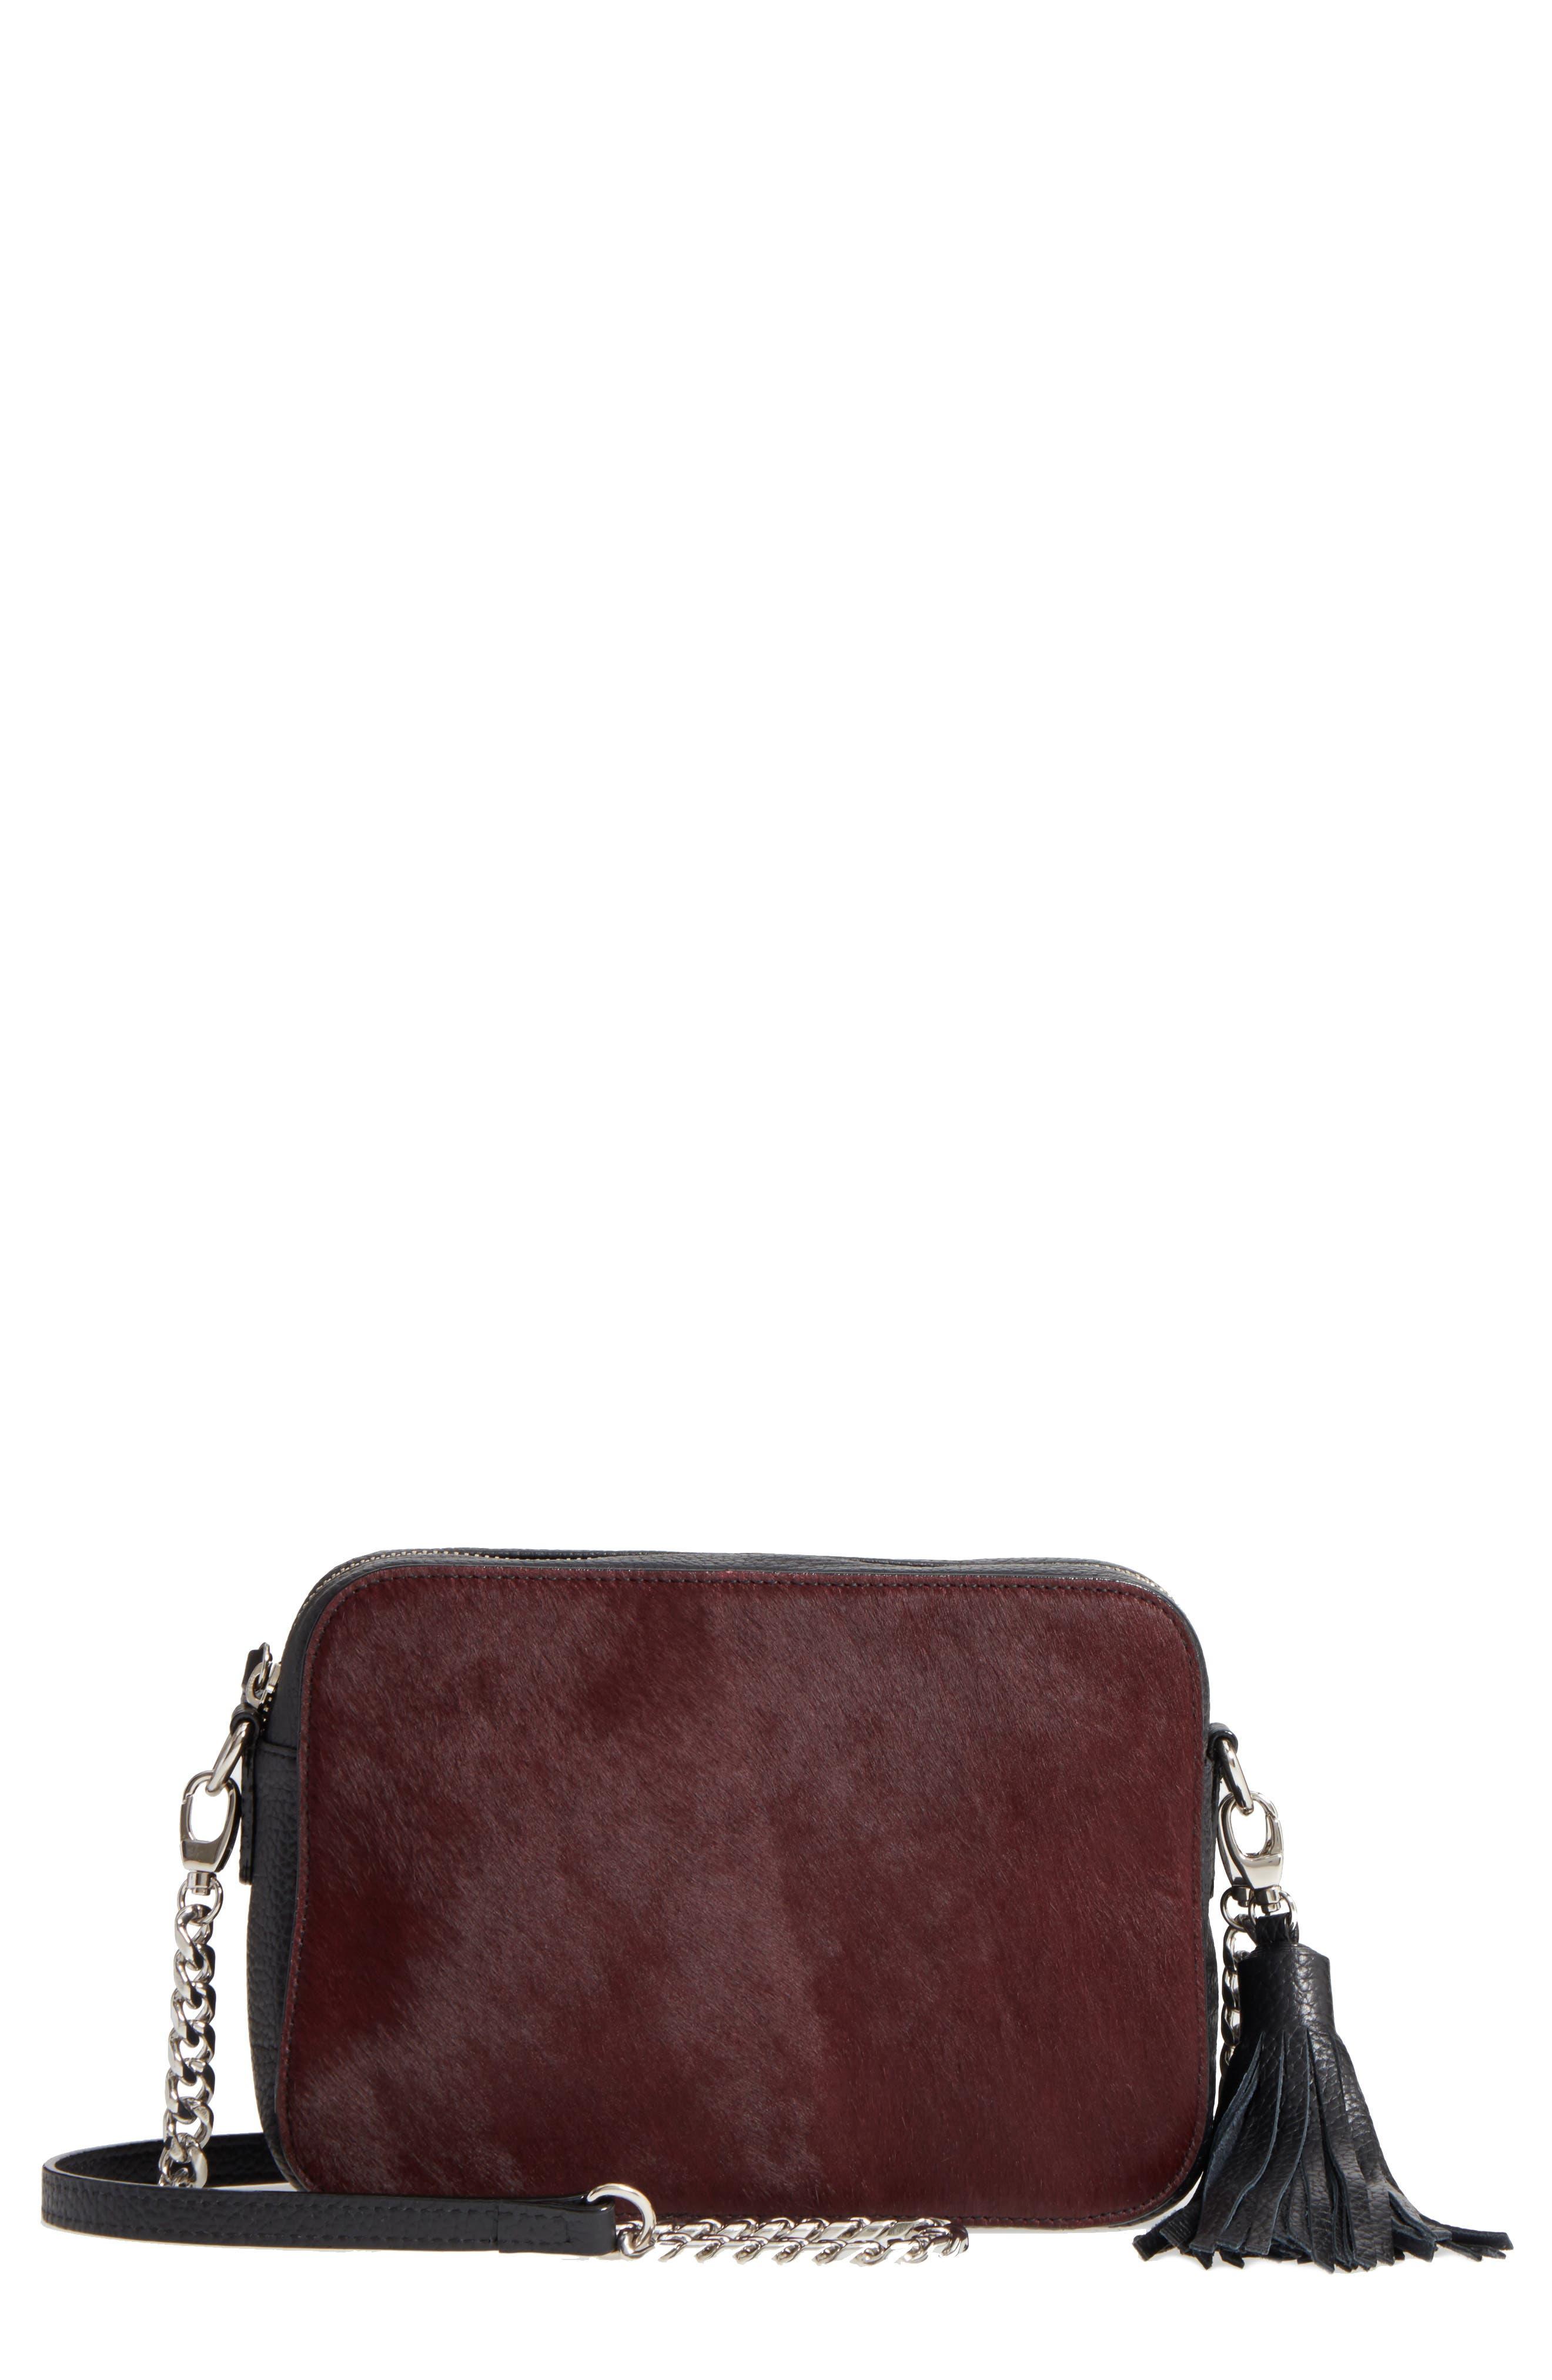 Main Image - Nordstrom Ella Leather & Genuine Calf Hair Crossbody Bag